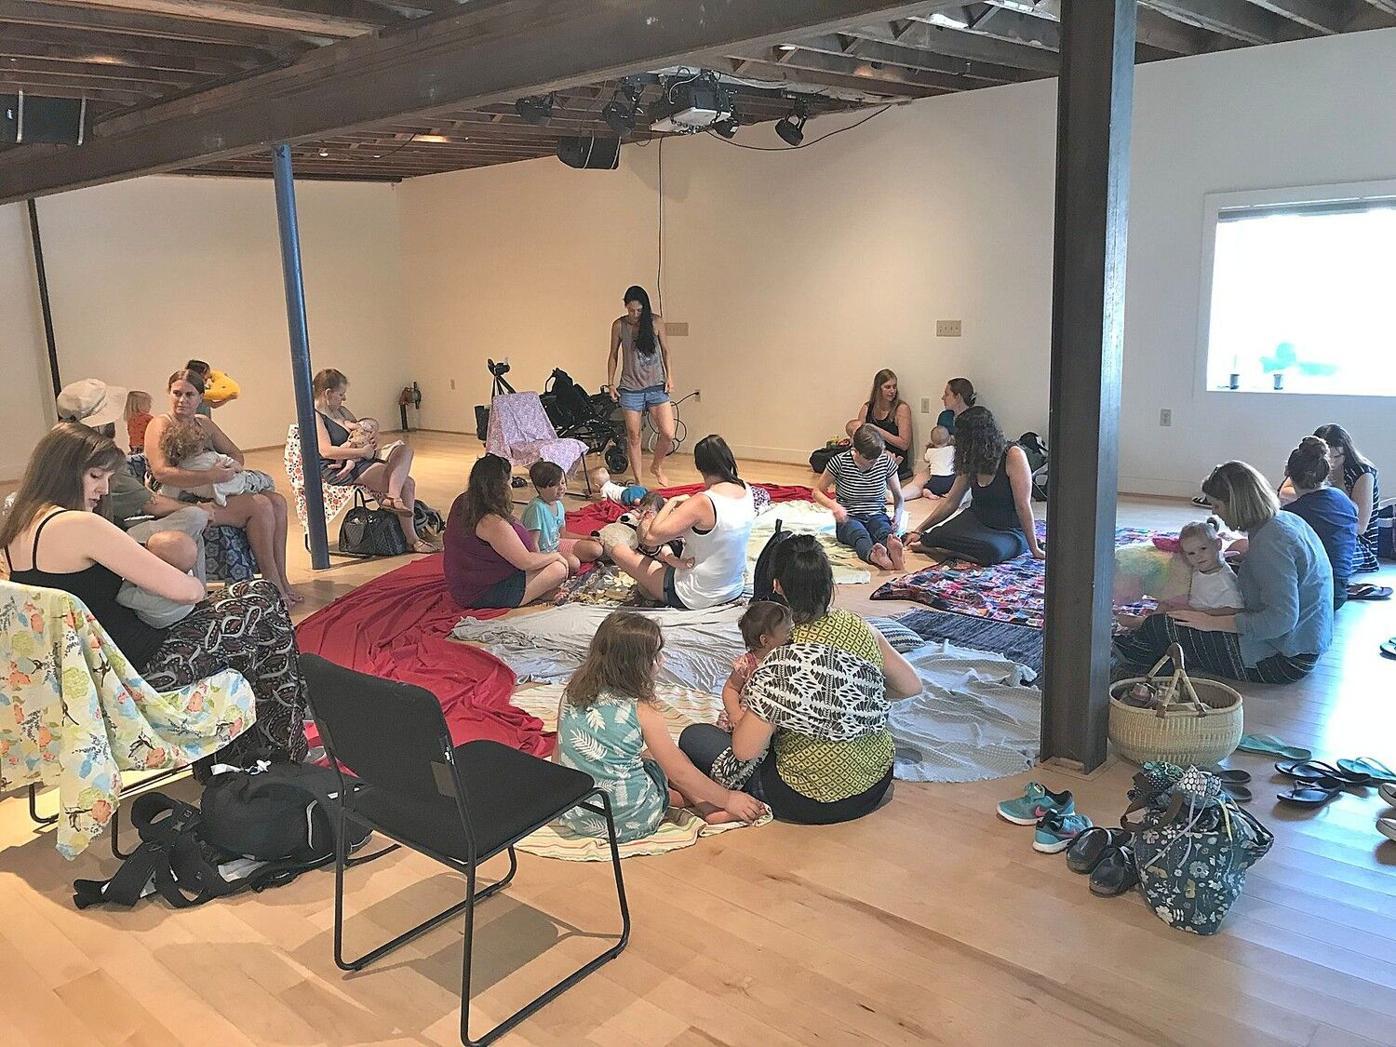 Brattleboro event celebrates breastfeeding